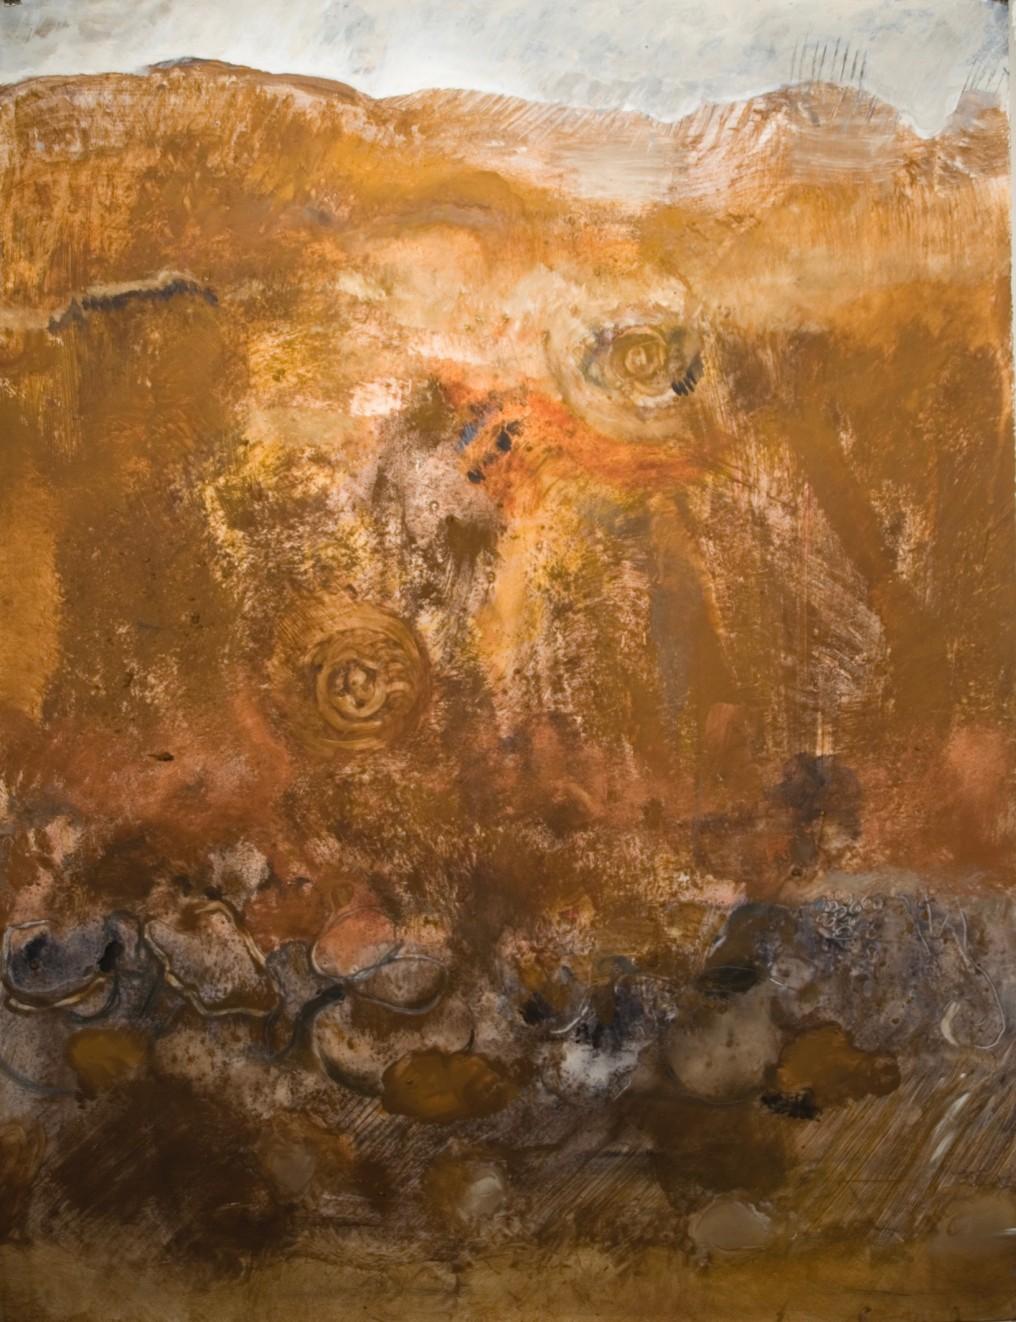 Powdered pigment, acrylic, graphite, on Stonehenge paper 50 x 38